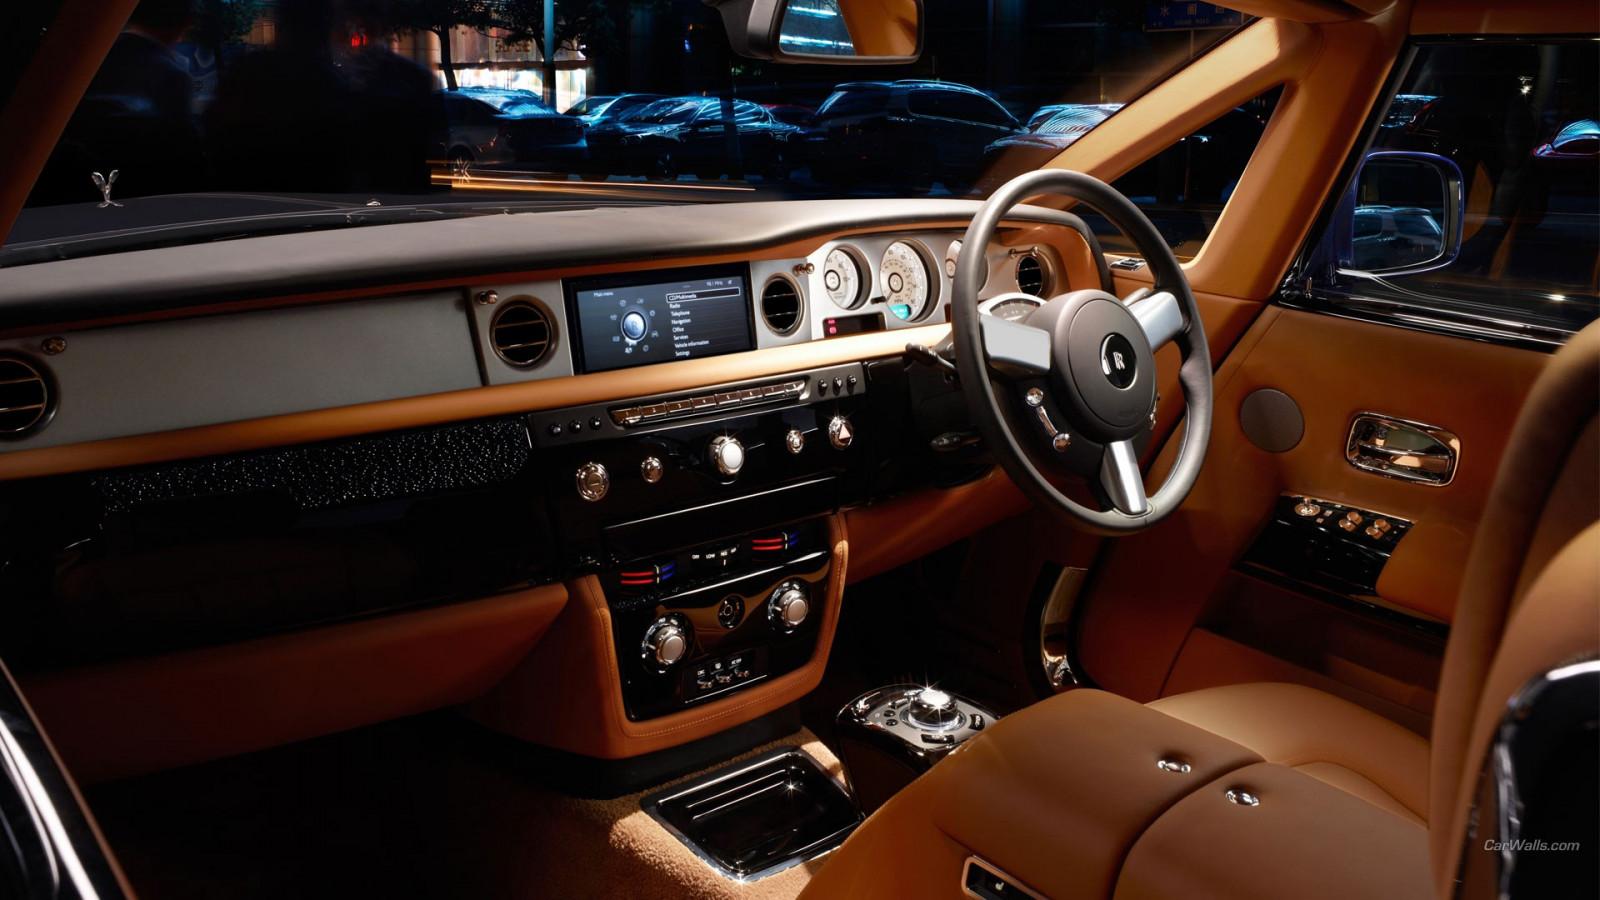 Wallpaper Car Interior Rolls Royce Performance Car Steering Wheel Sedan Rolls Royce Phantom Land Vehicle Automotive Design Automotive Exterior Automobile Make Luxury Vehicle Sport Utility Vehicle Mid Size Car Auto Show